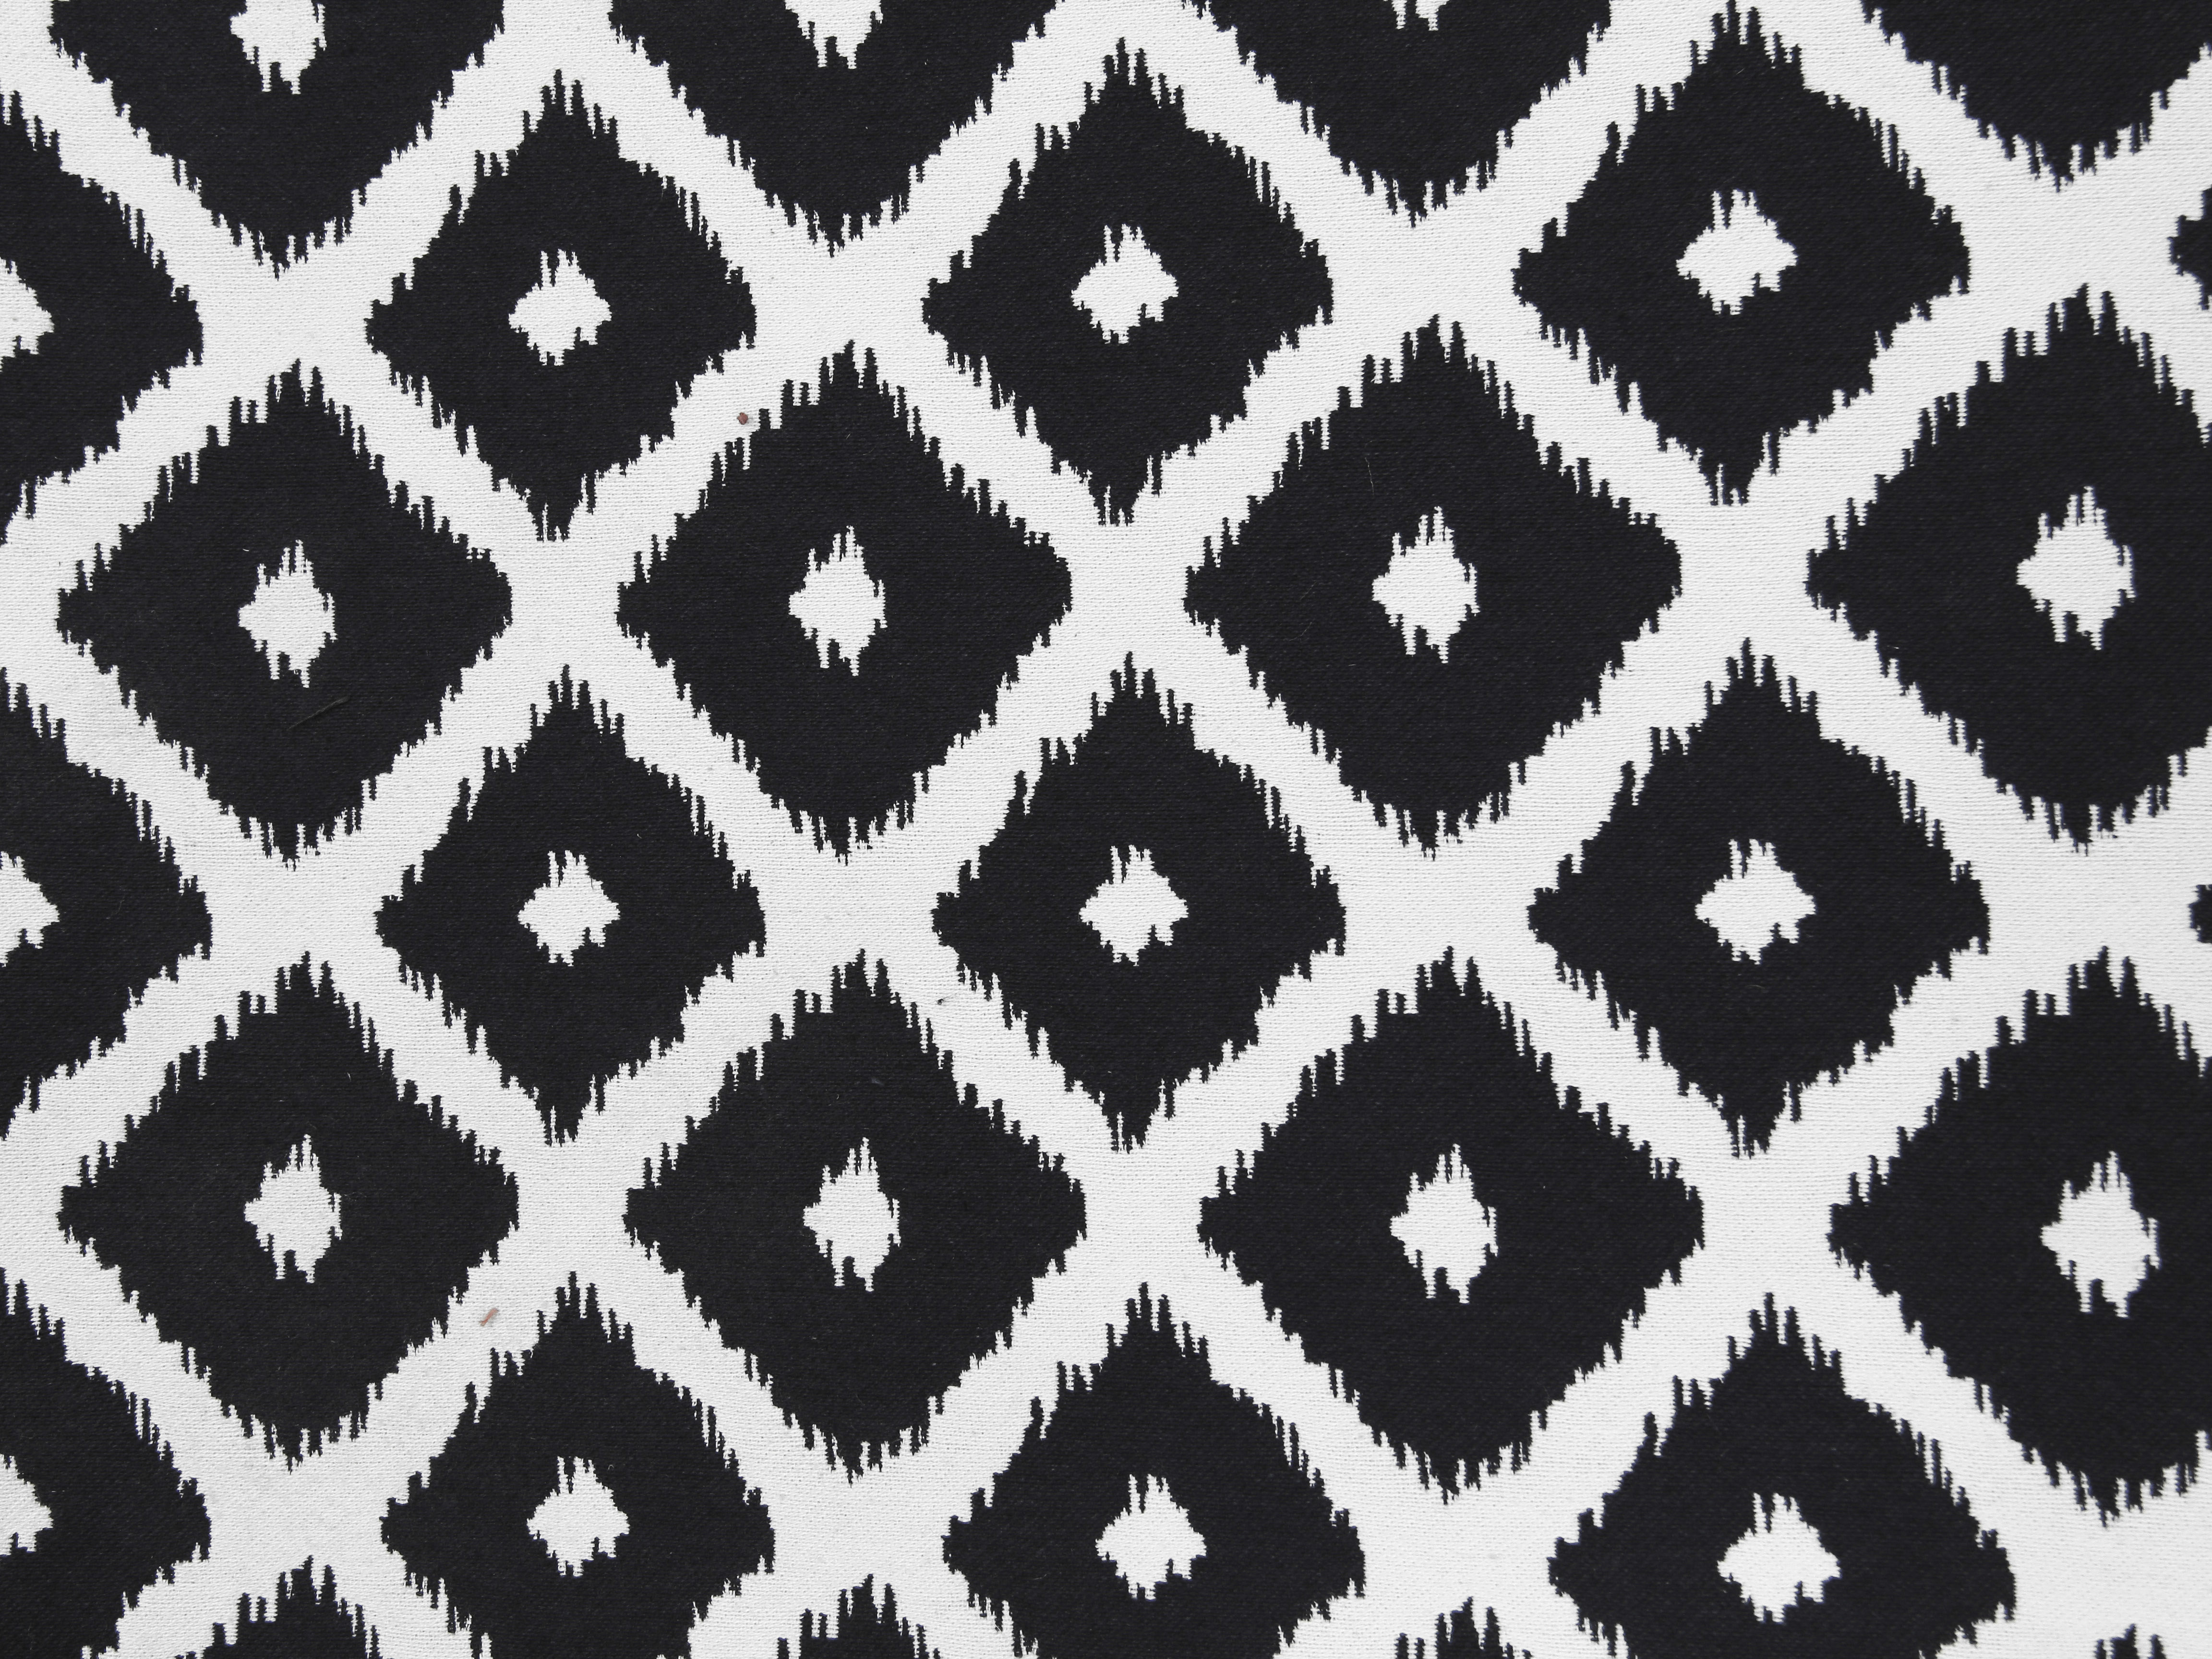 fabric texture black white decor pattern vintage cloth wallpaper 4608x3456